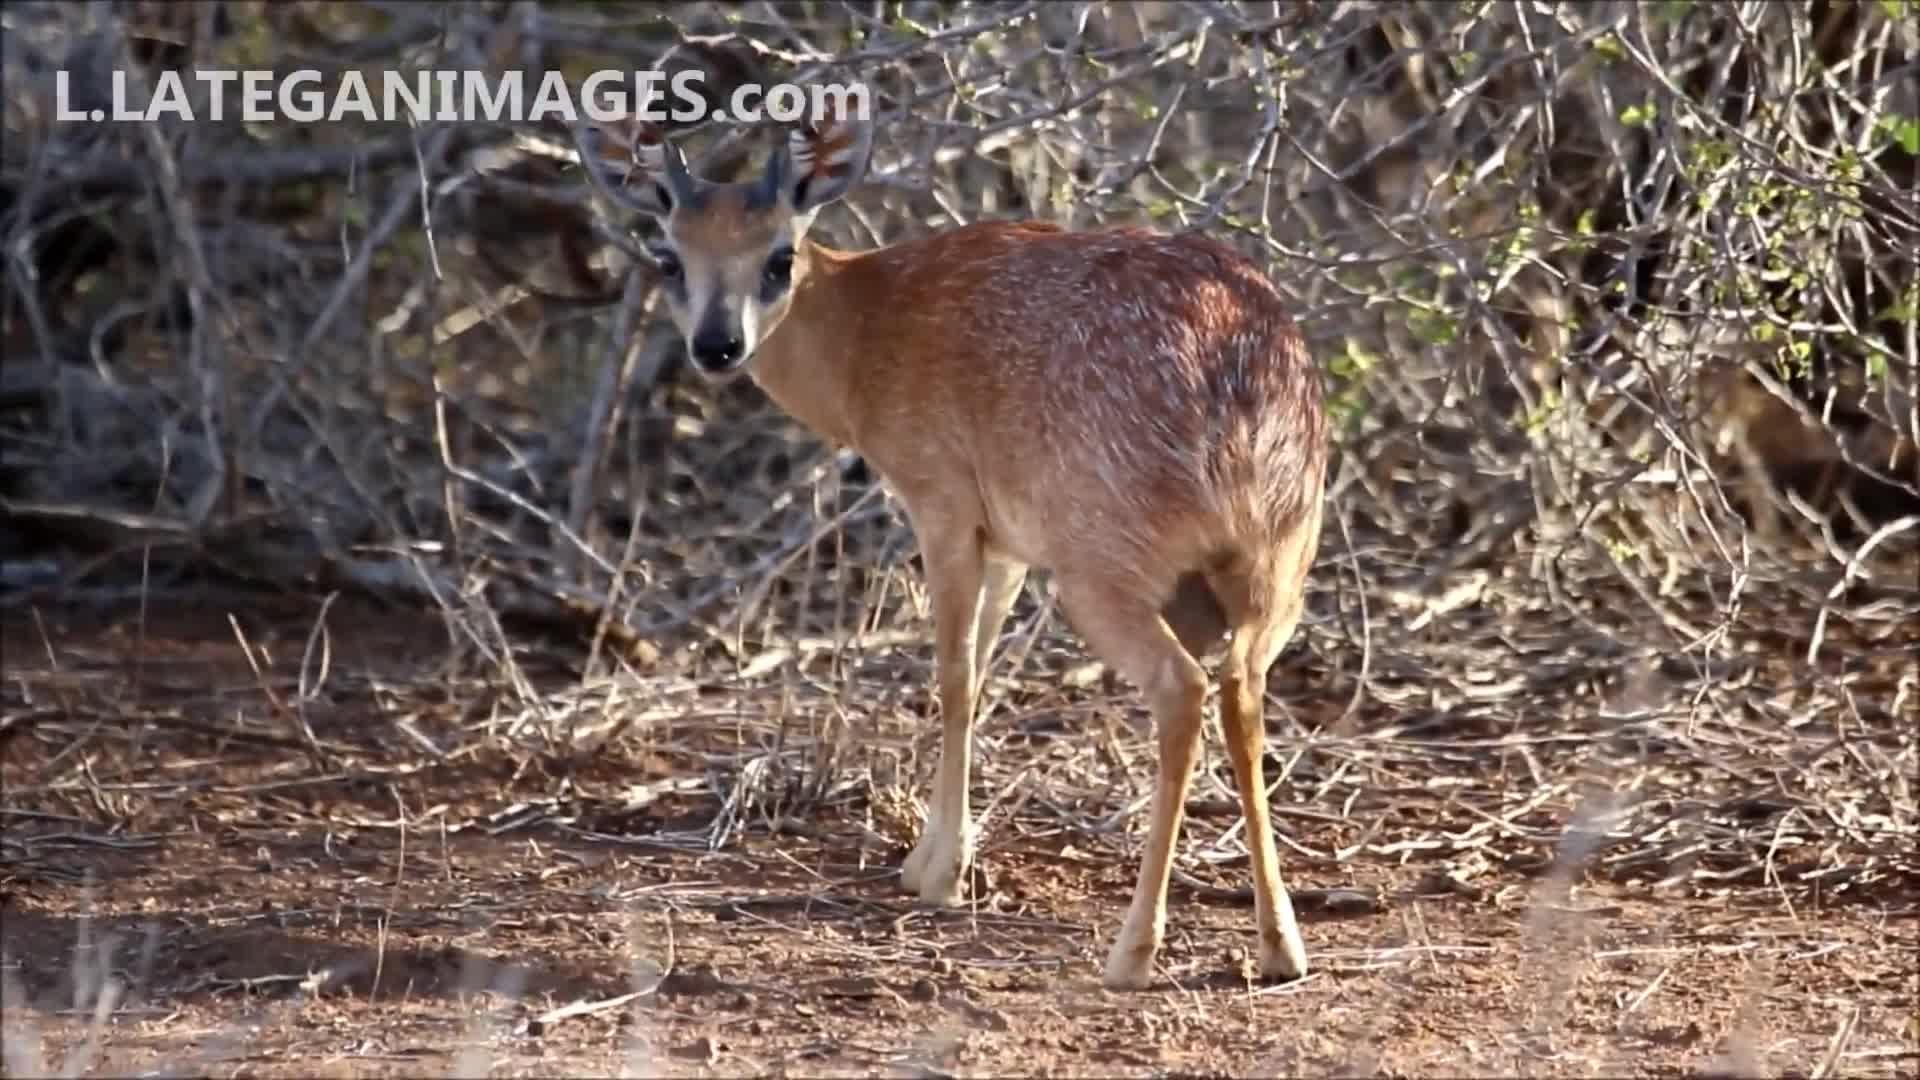 Grysbok, Mammals of Southern Africa, Northern Grysbok, Pets & Animals, Sharpe`s Grysbok, l lategan images, liaan lategan, Sharpe's Grysbok or Northern Grysbok Raphicerus sharpei GIFs